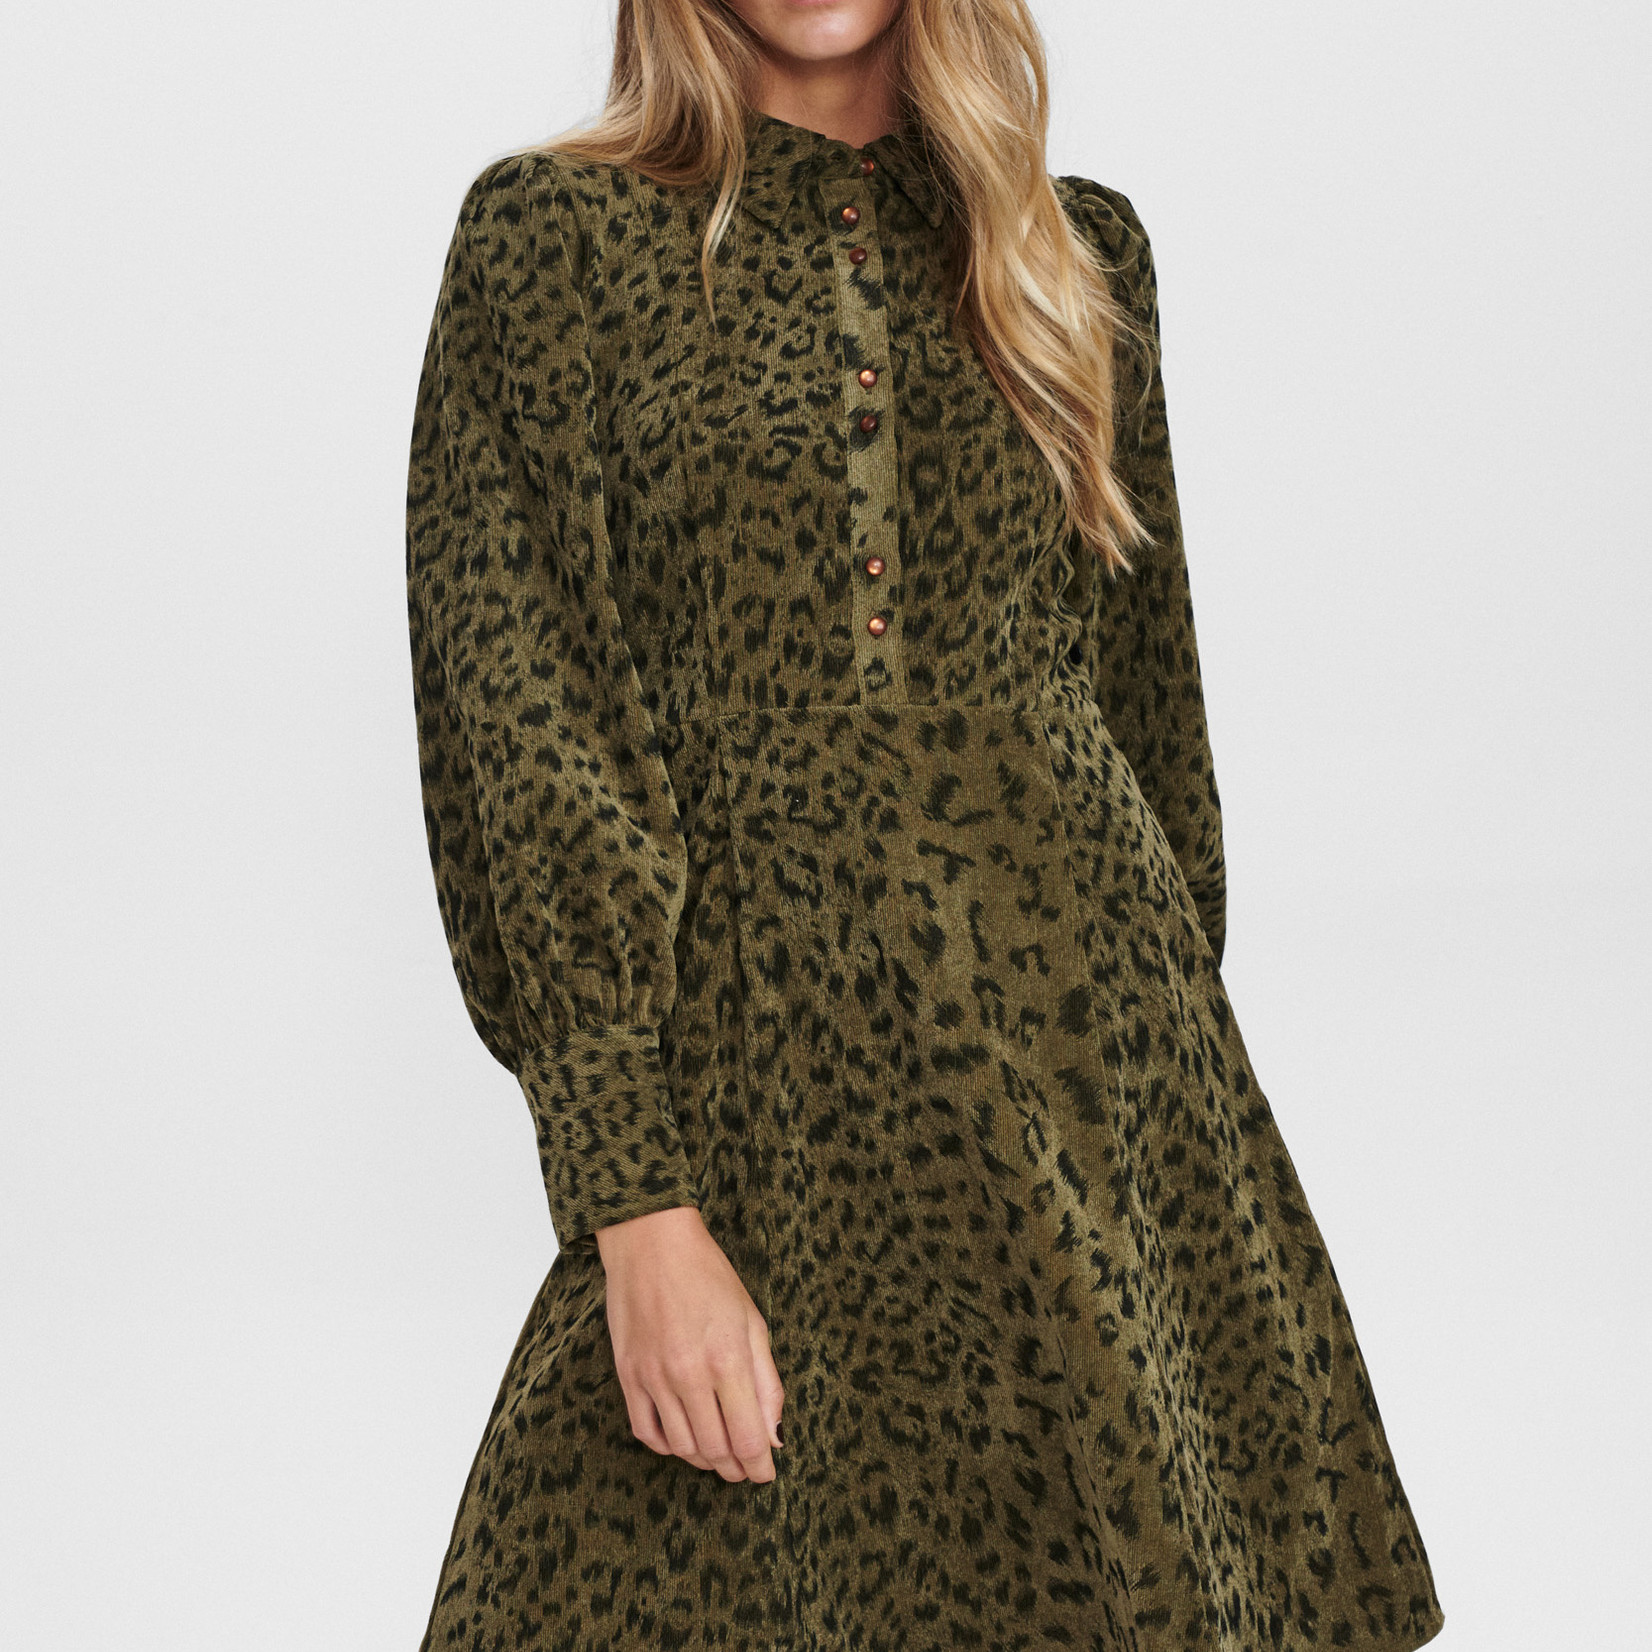 NÜMPH NUCHELSEA DRESS, leopard print jurk